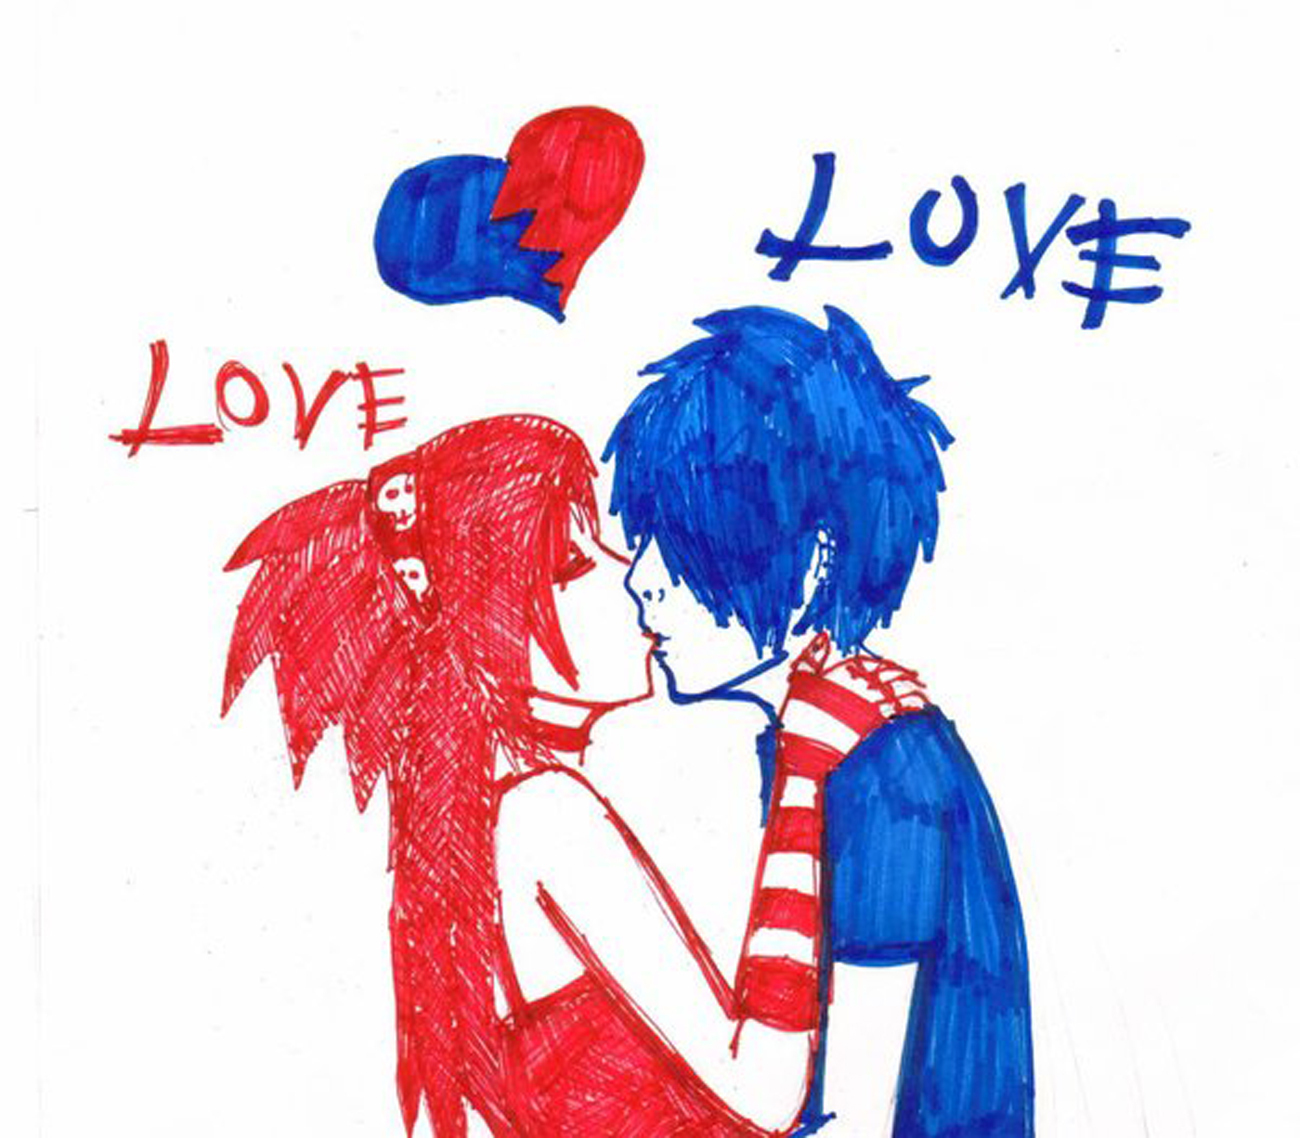 Emo Love Emo 8825376 1300 1138